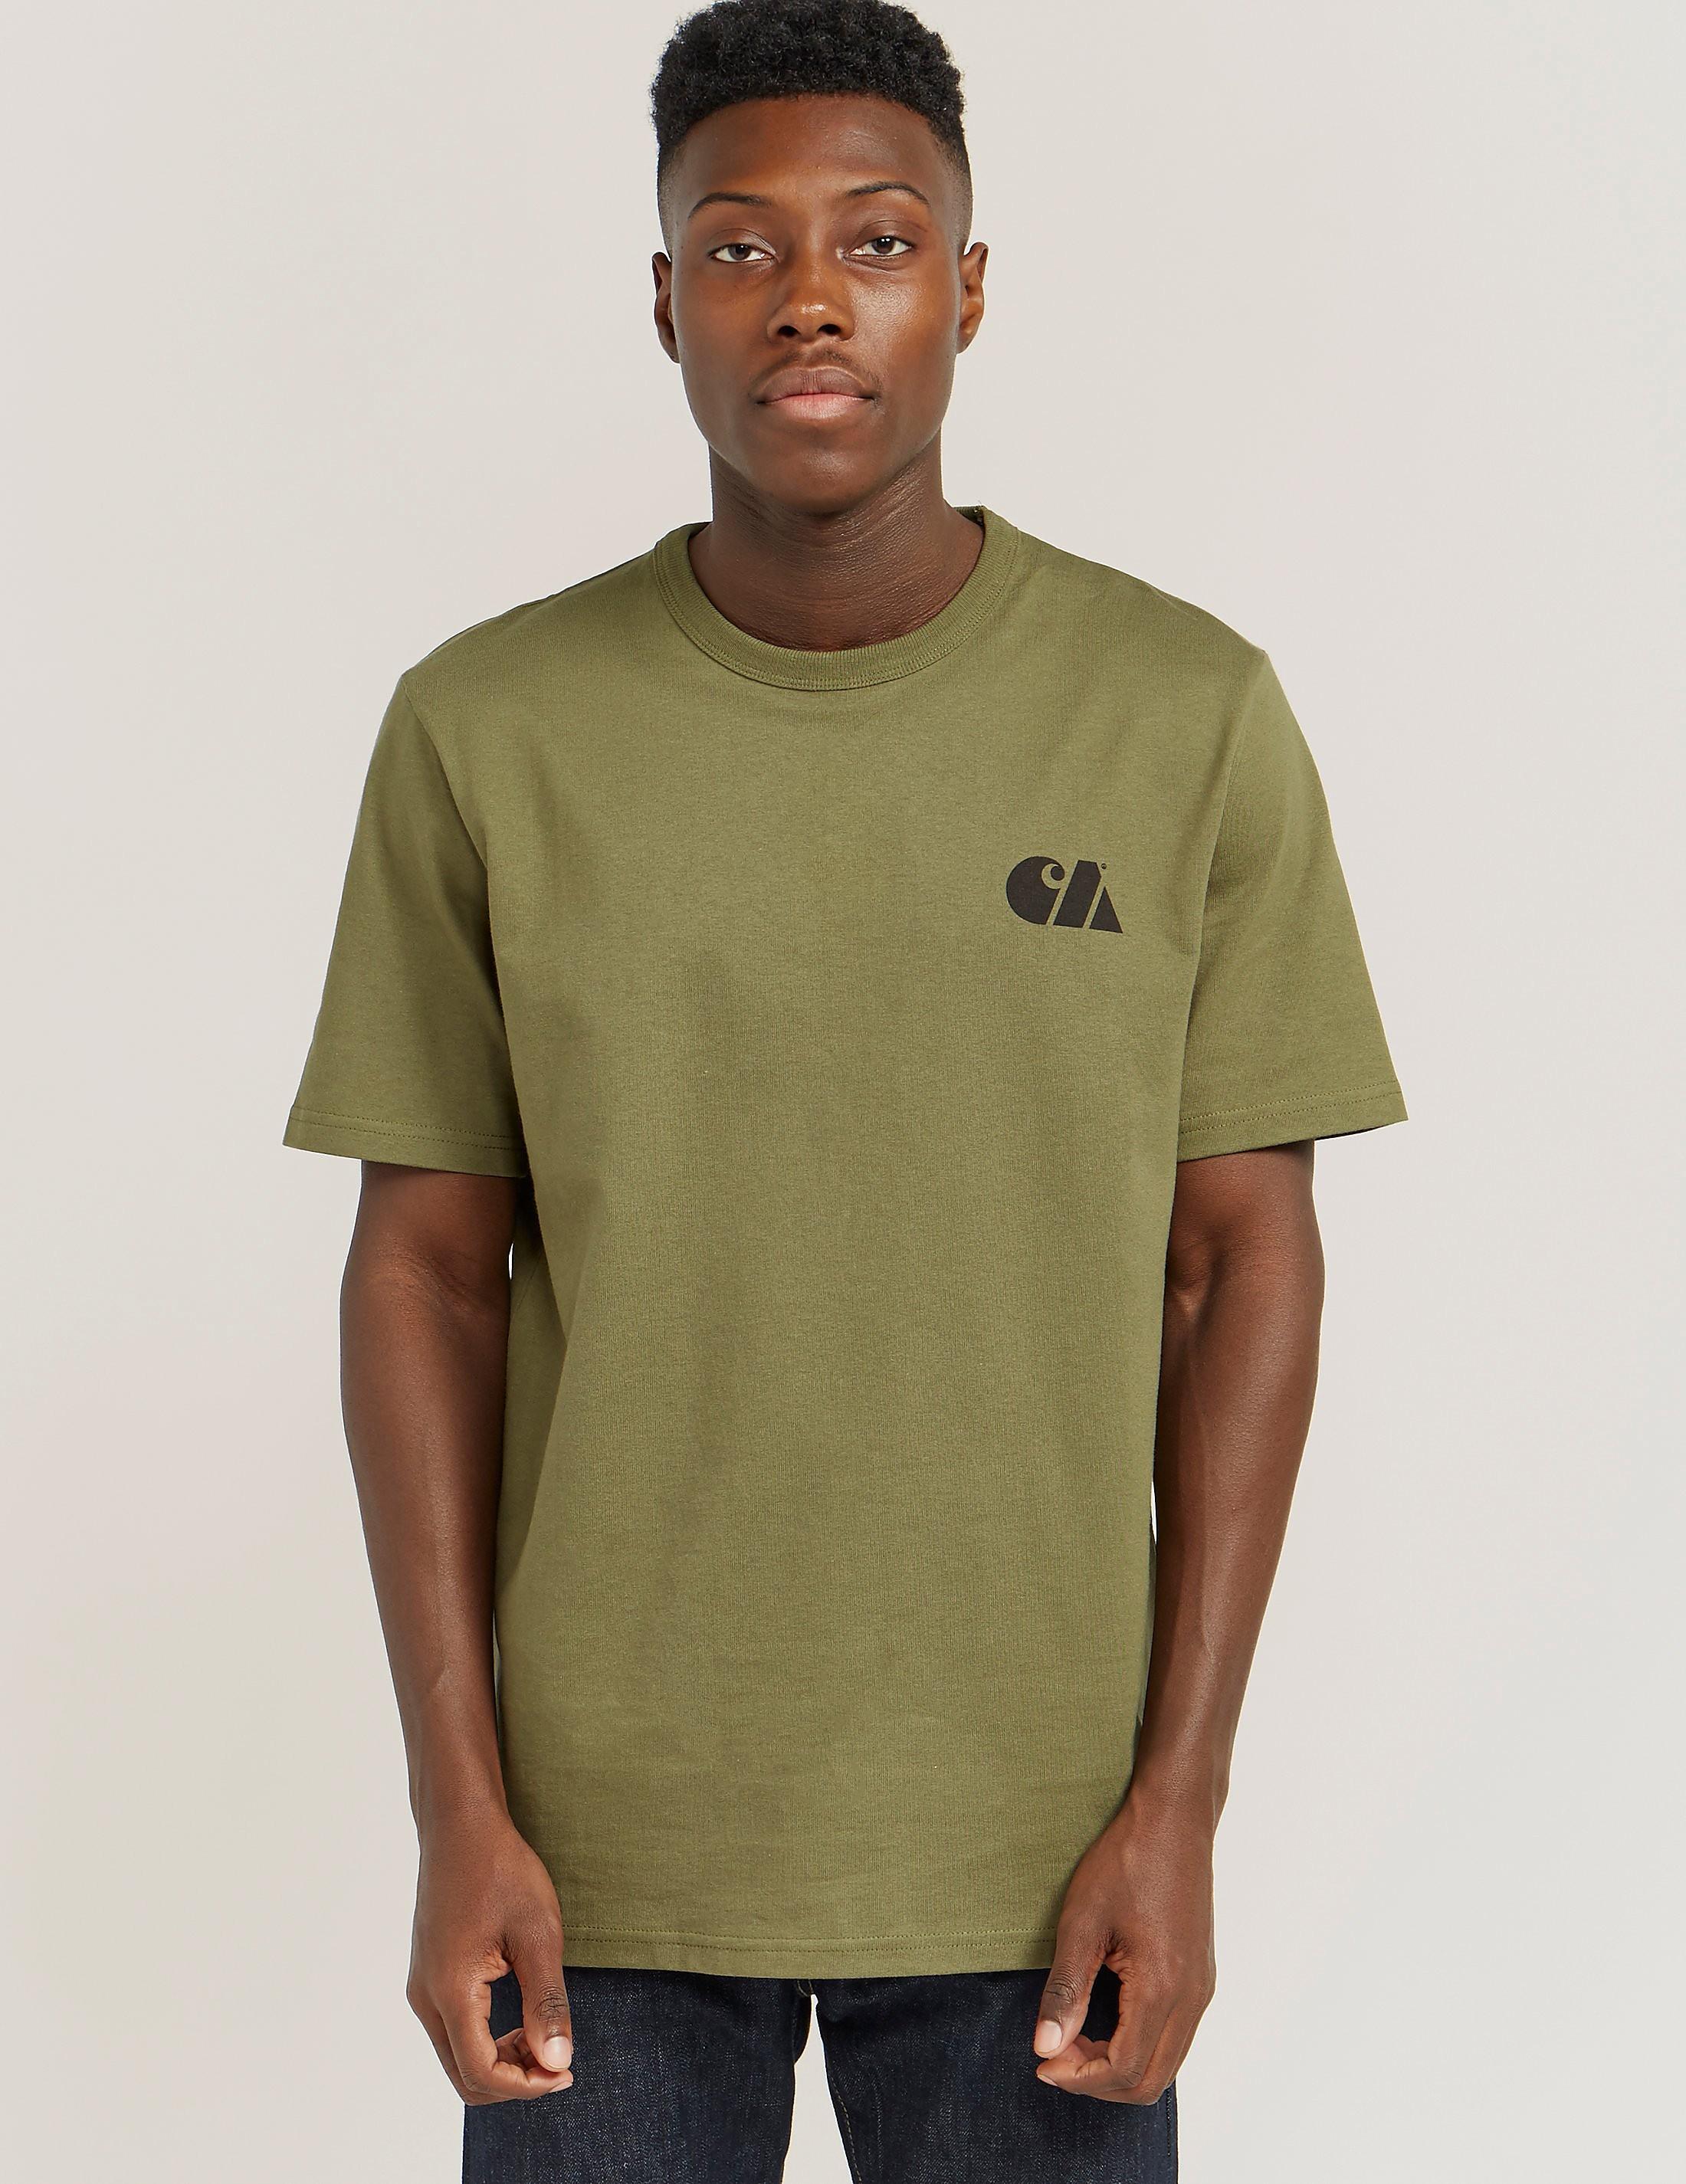 Carhartt WIP Military Short Sleeve T-Shirt